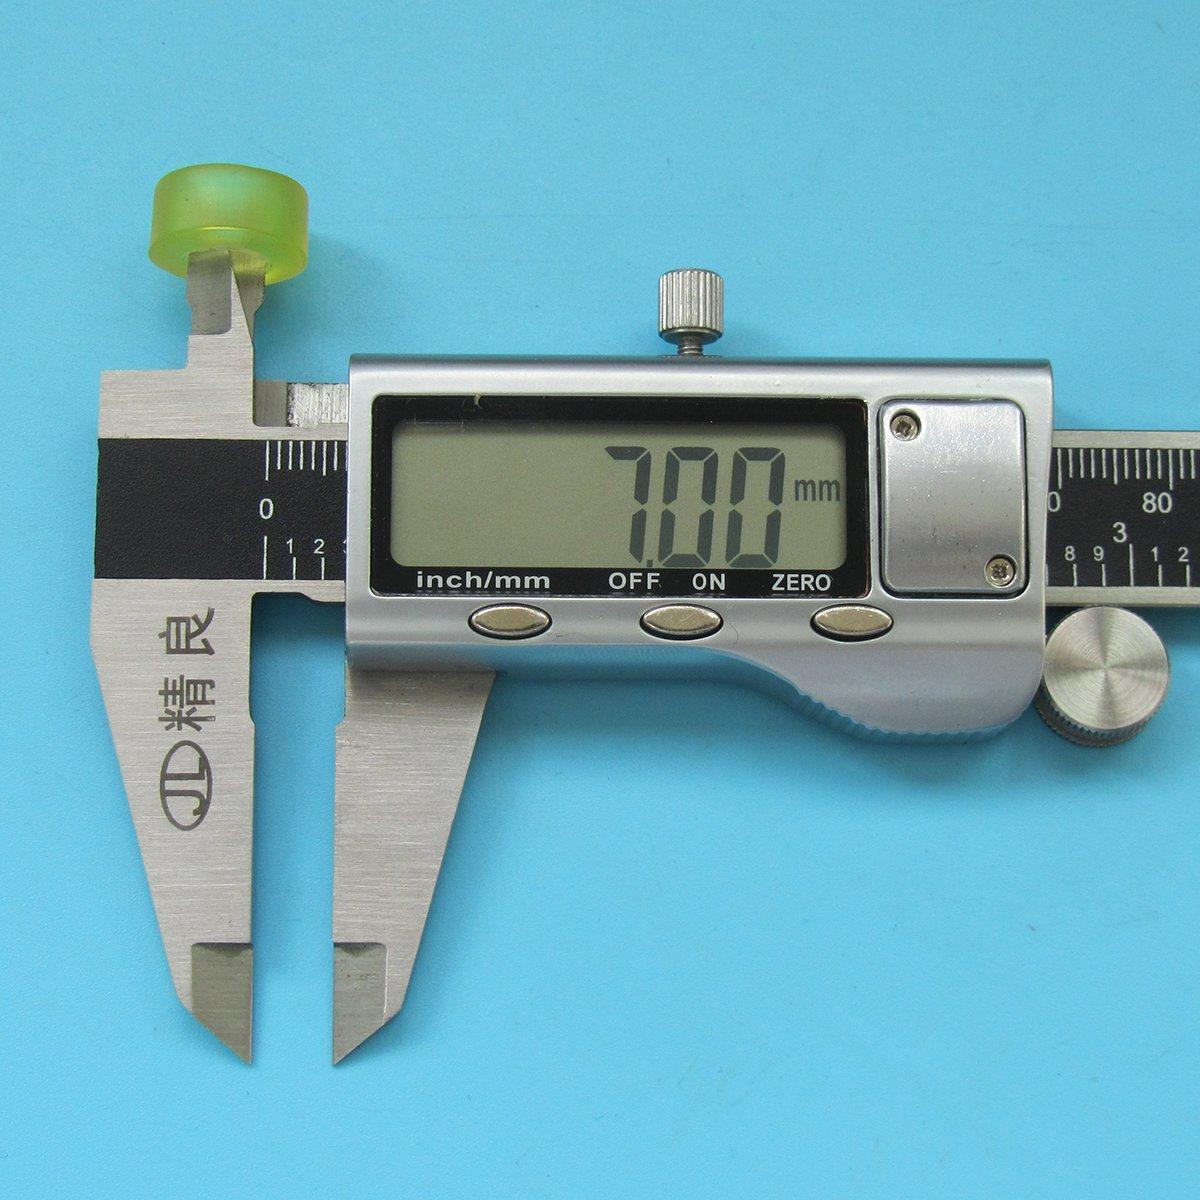 10PCS #HT230220 Needle Bar Stopper for BARUDAN Embroidery Machine KUNPENG